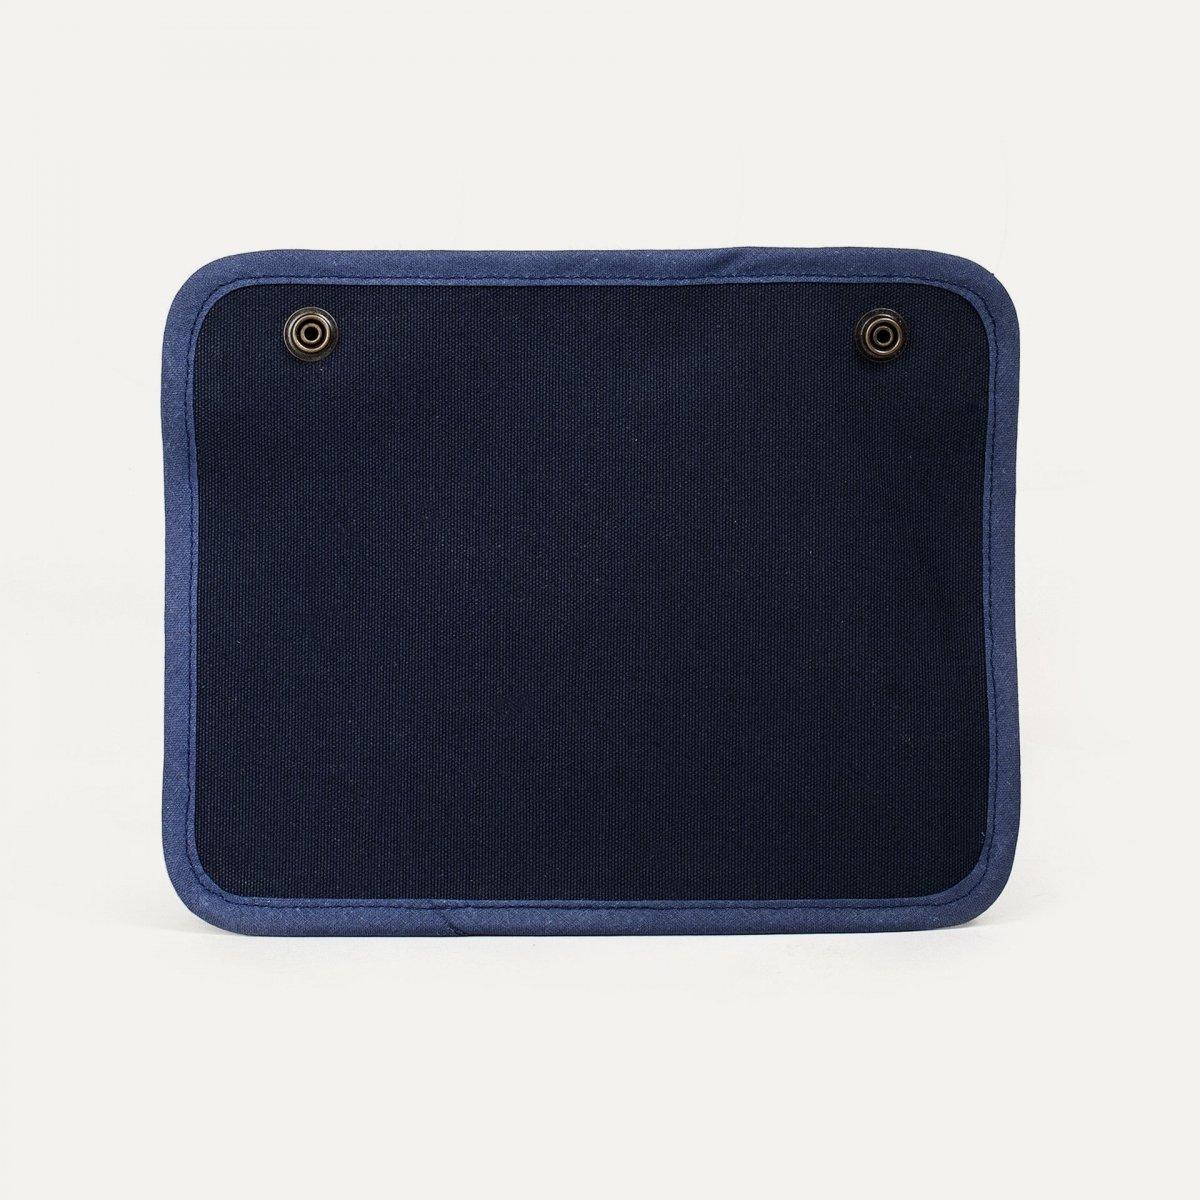 Zipped pocket  - Blue (image n°2)